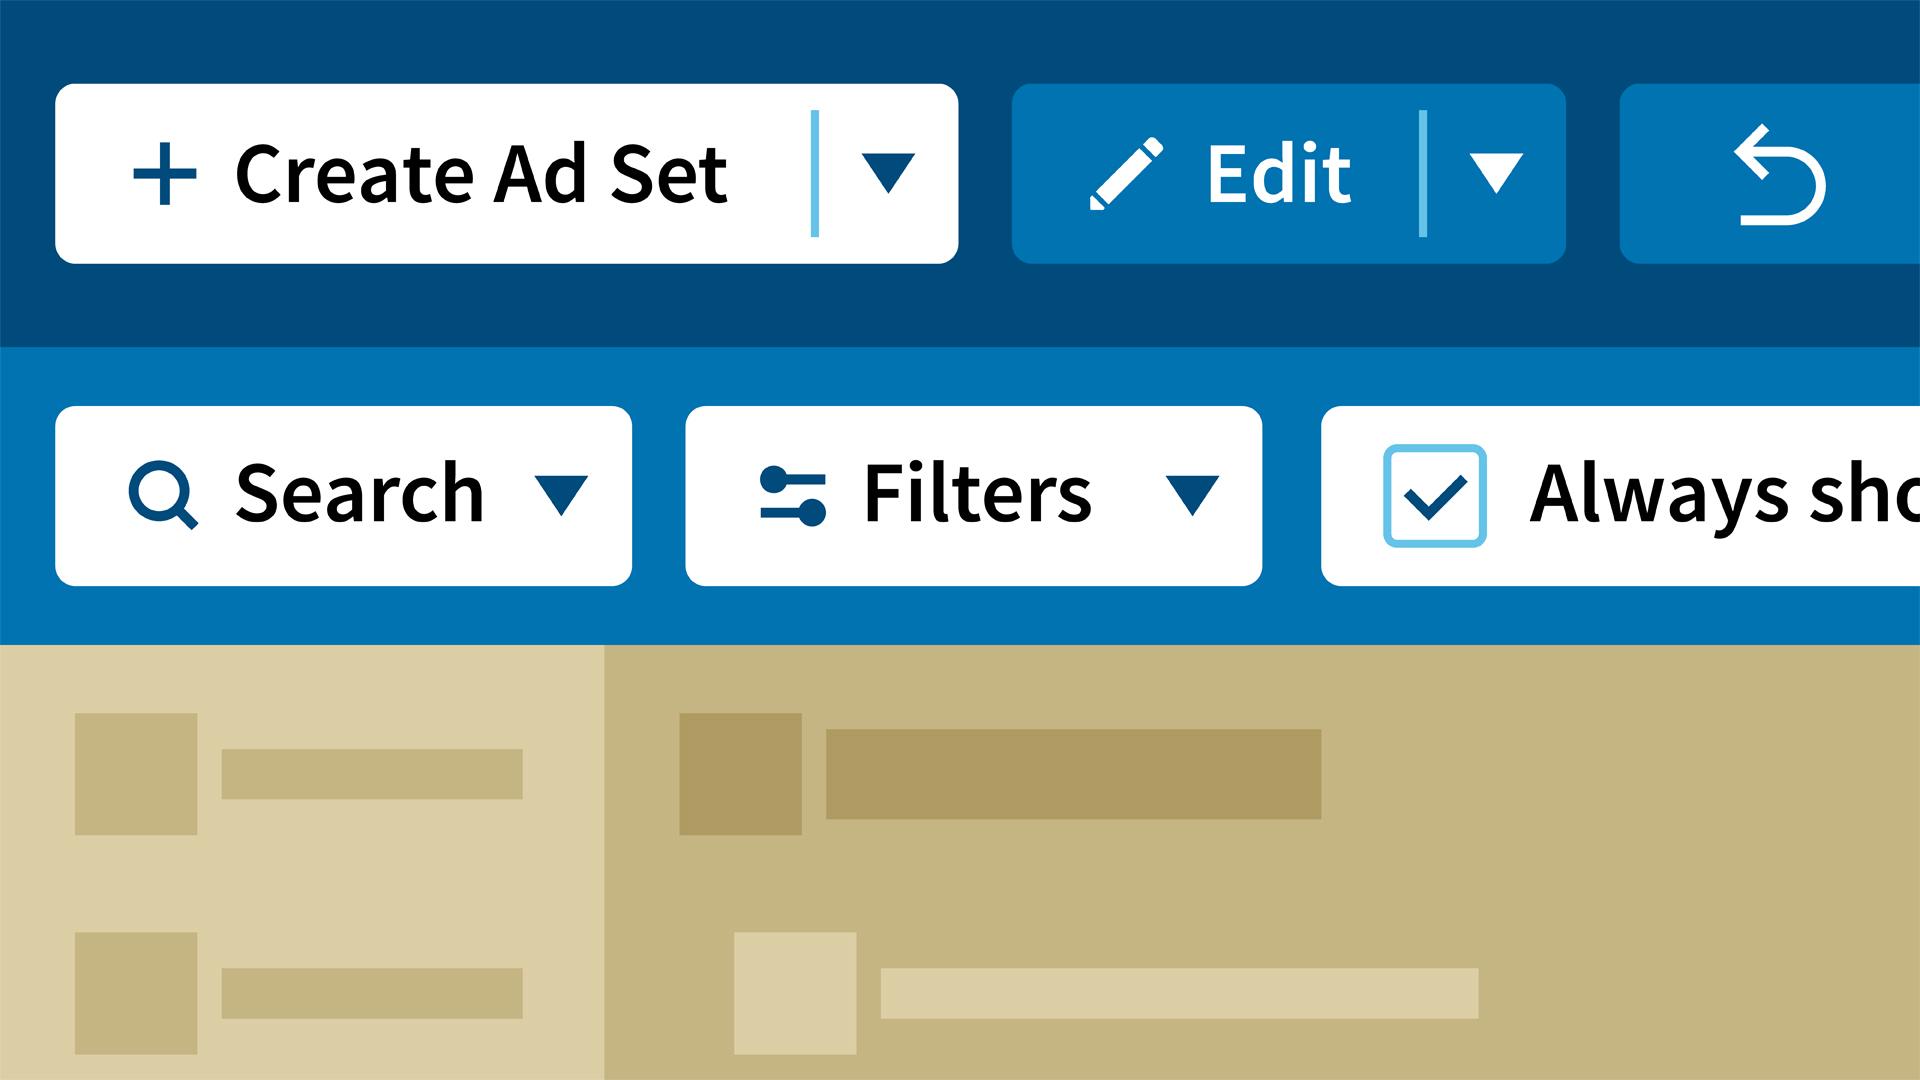 windows server 2012 r2 product key facebook